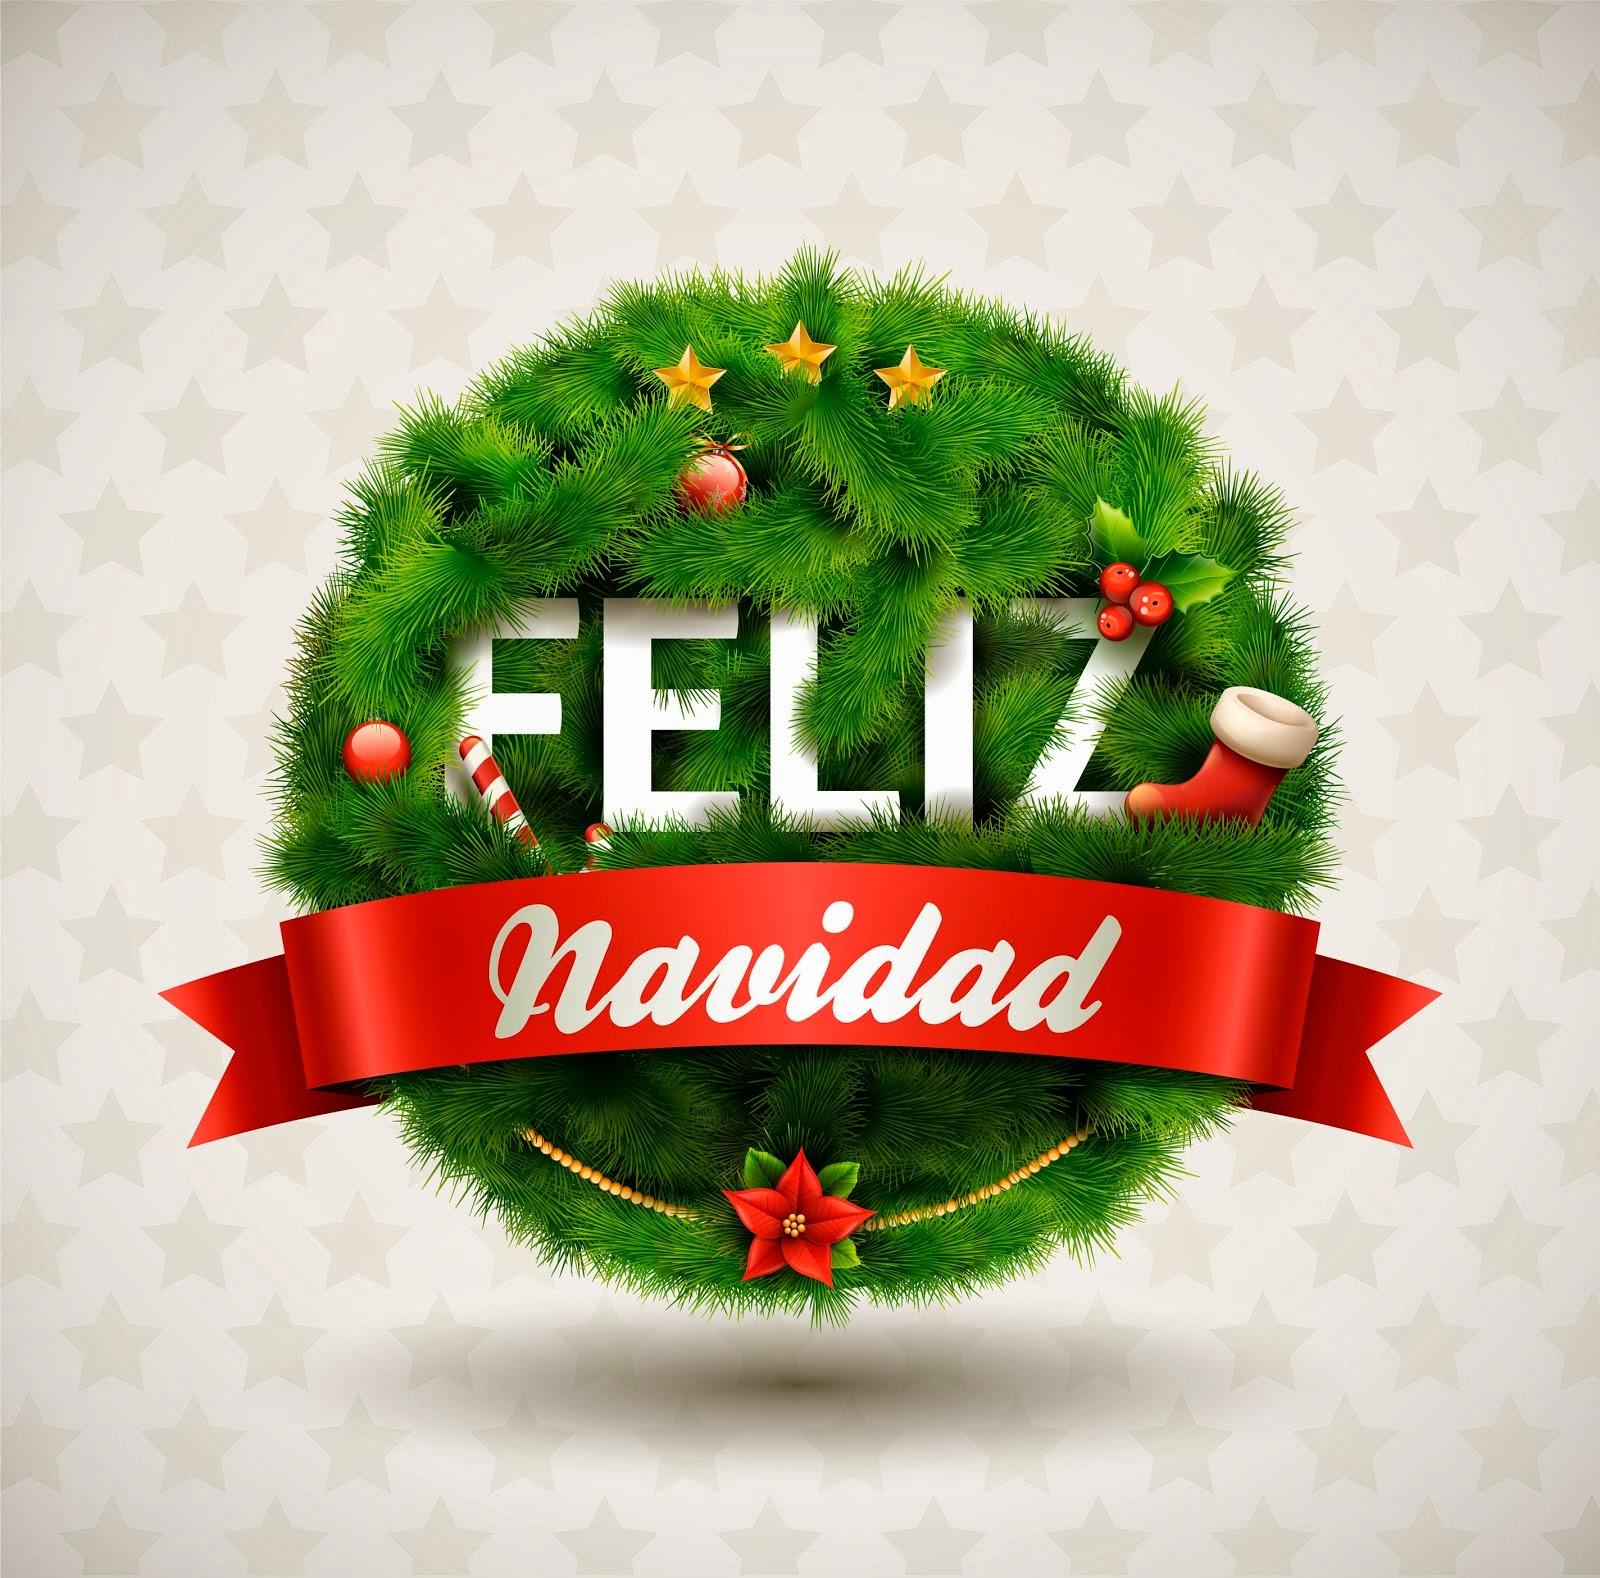 feliz navidad | free Wallpapers